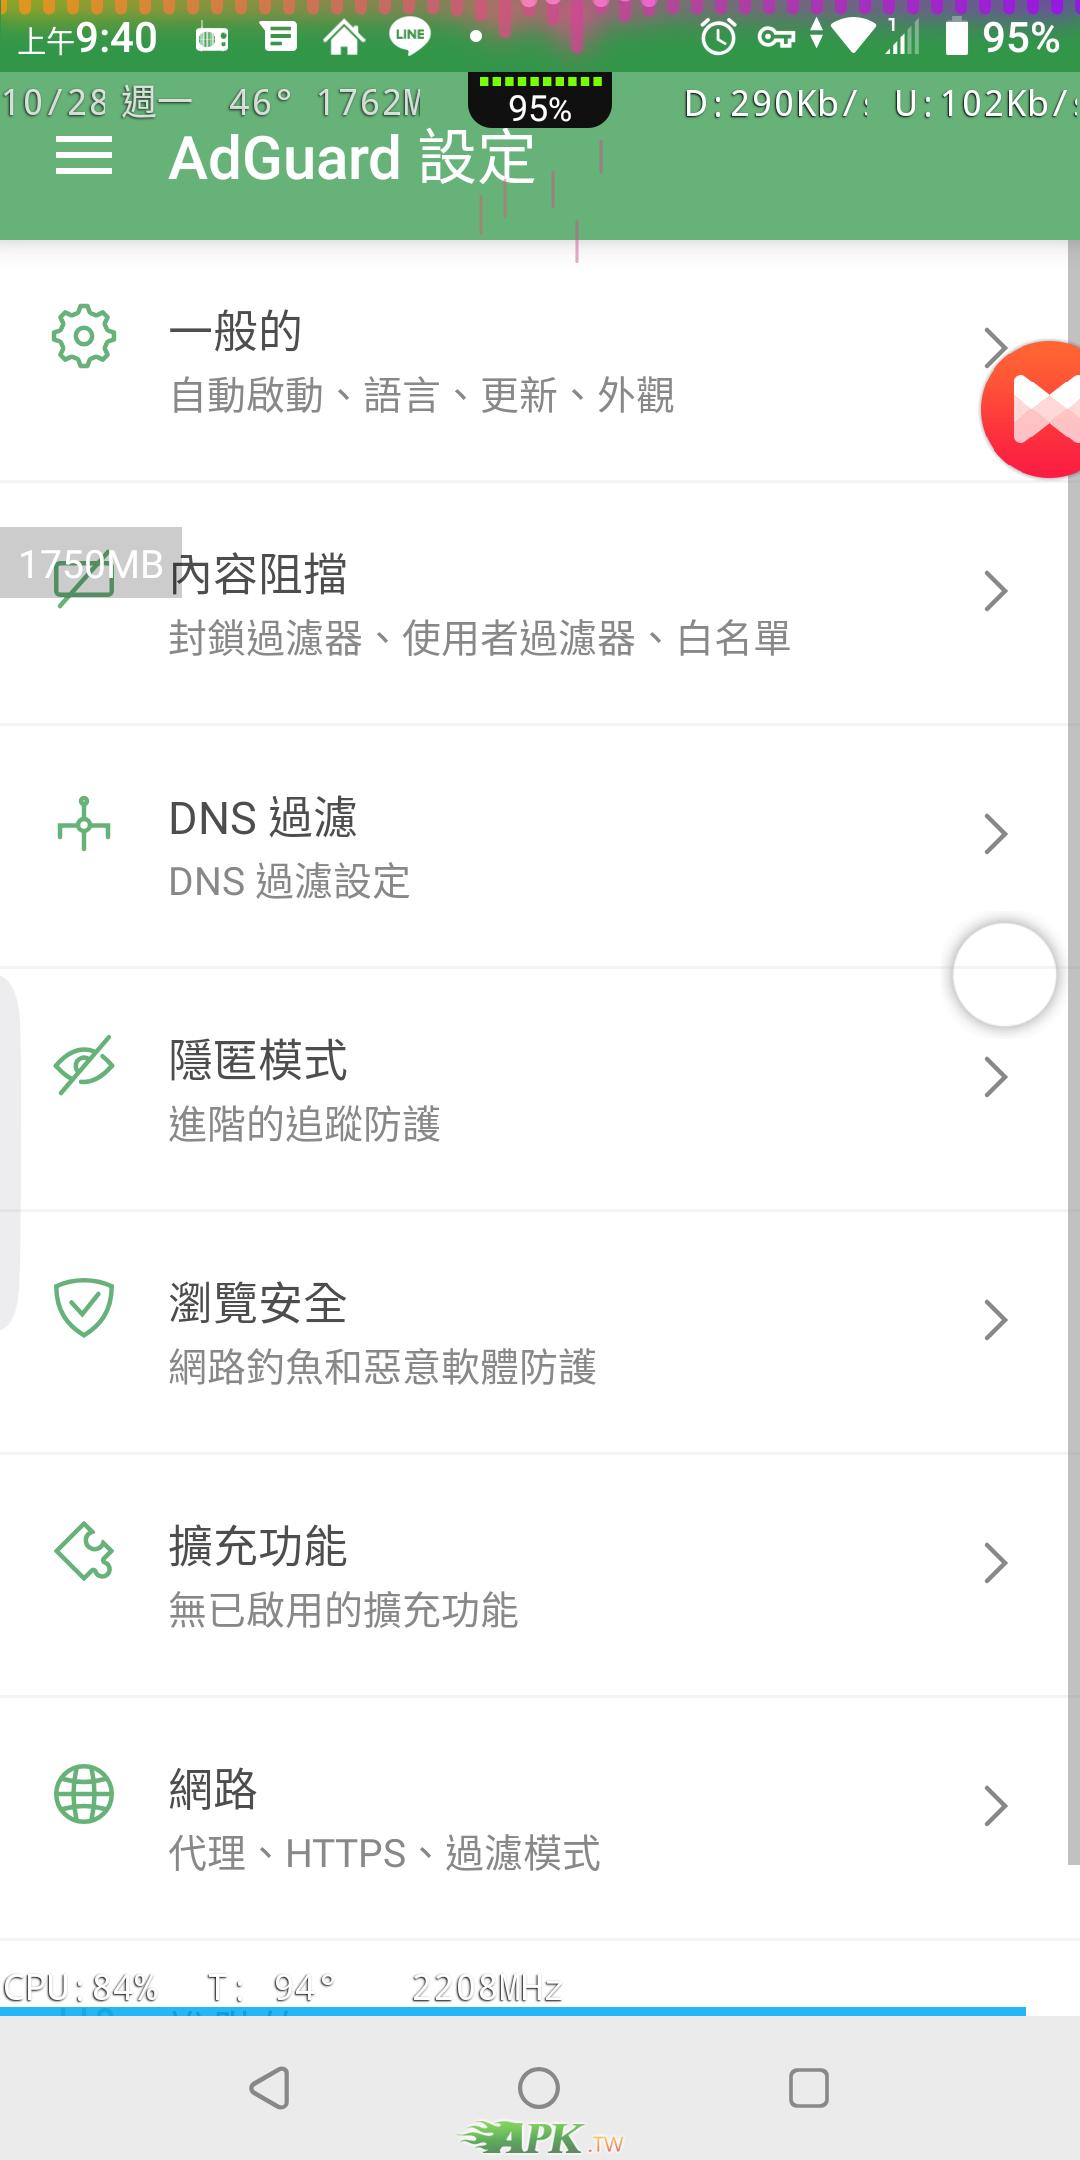 Screenshot_20191028-094039.png